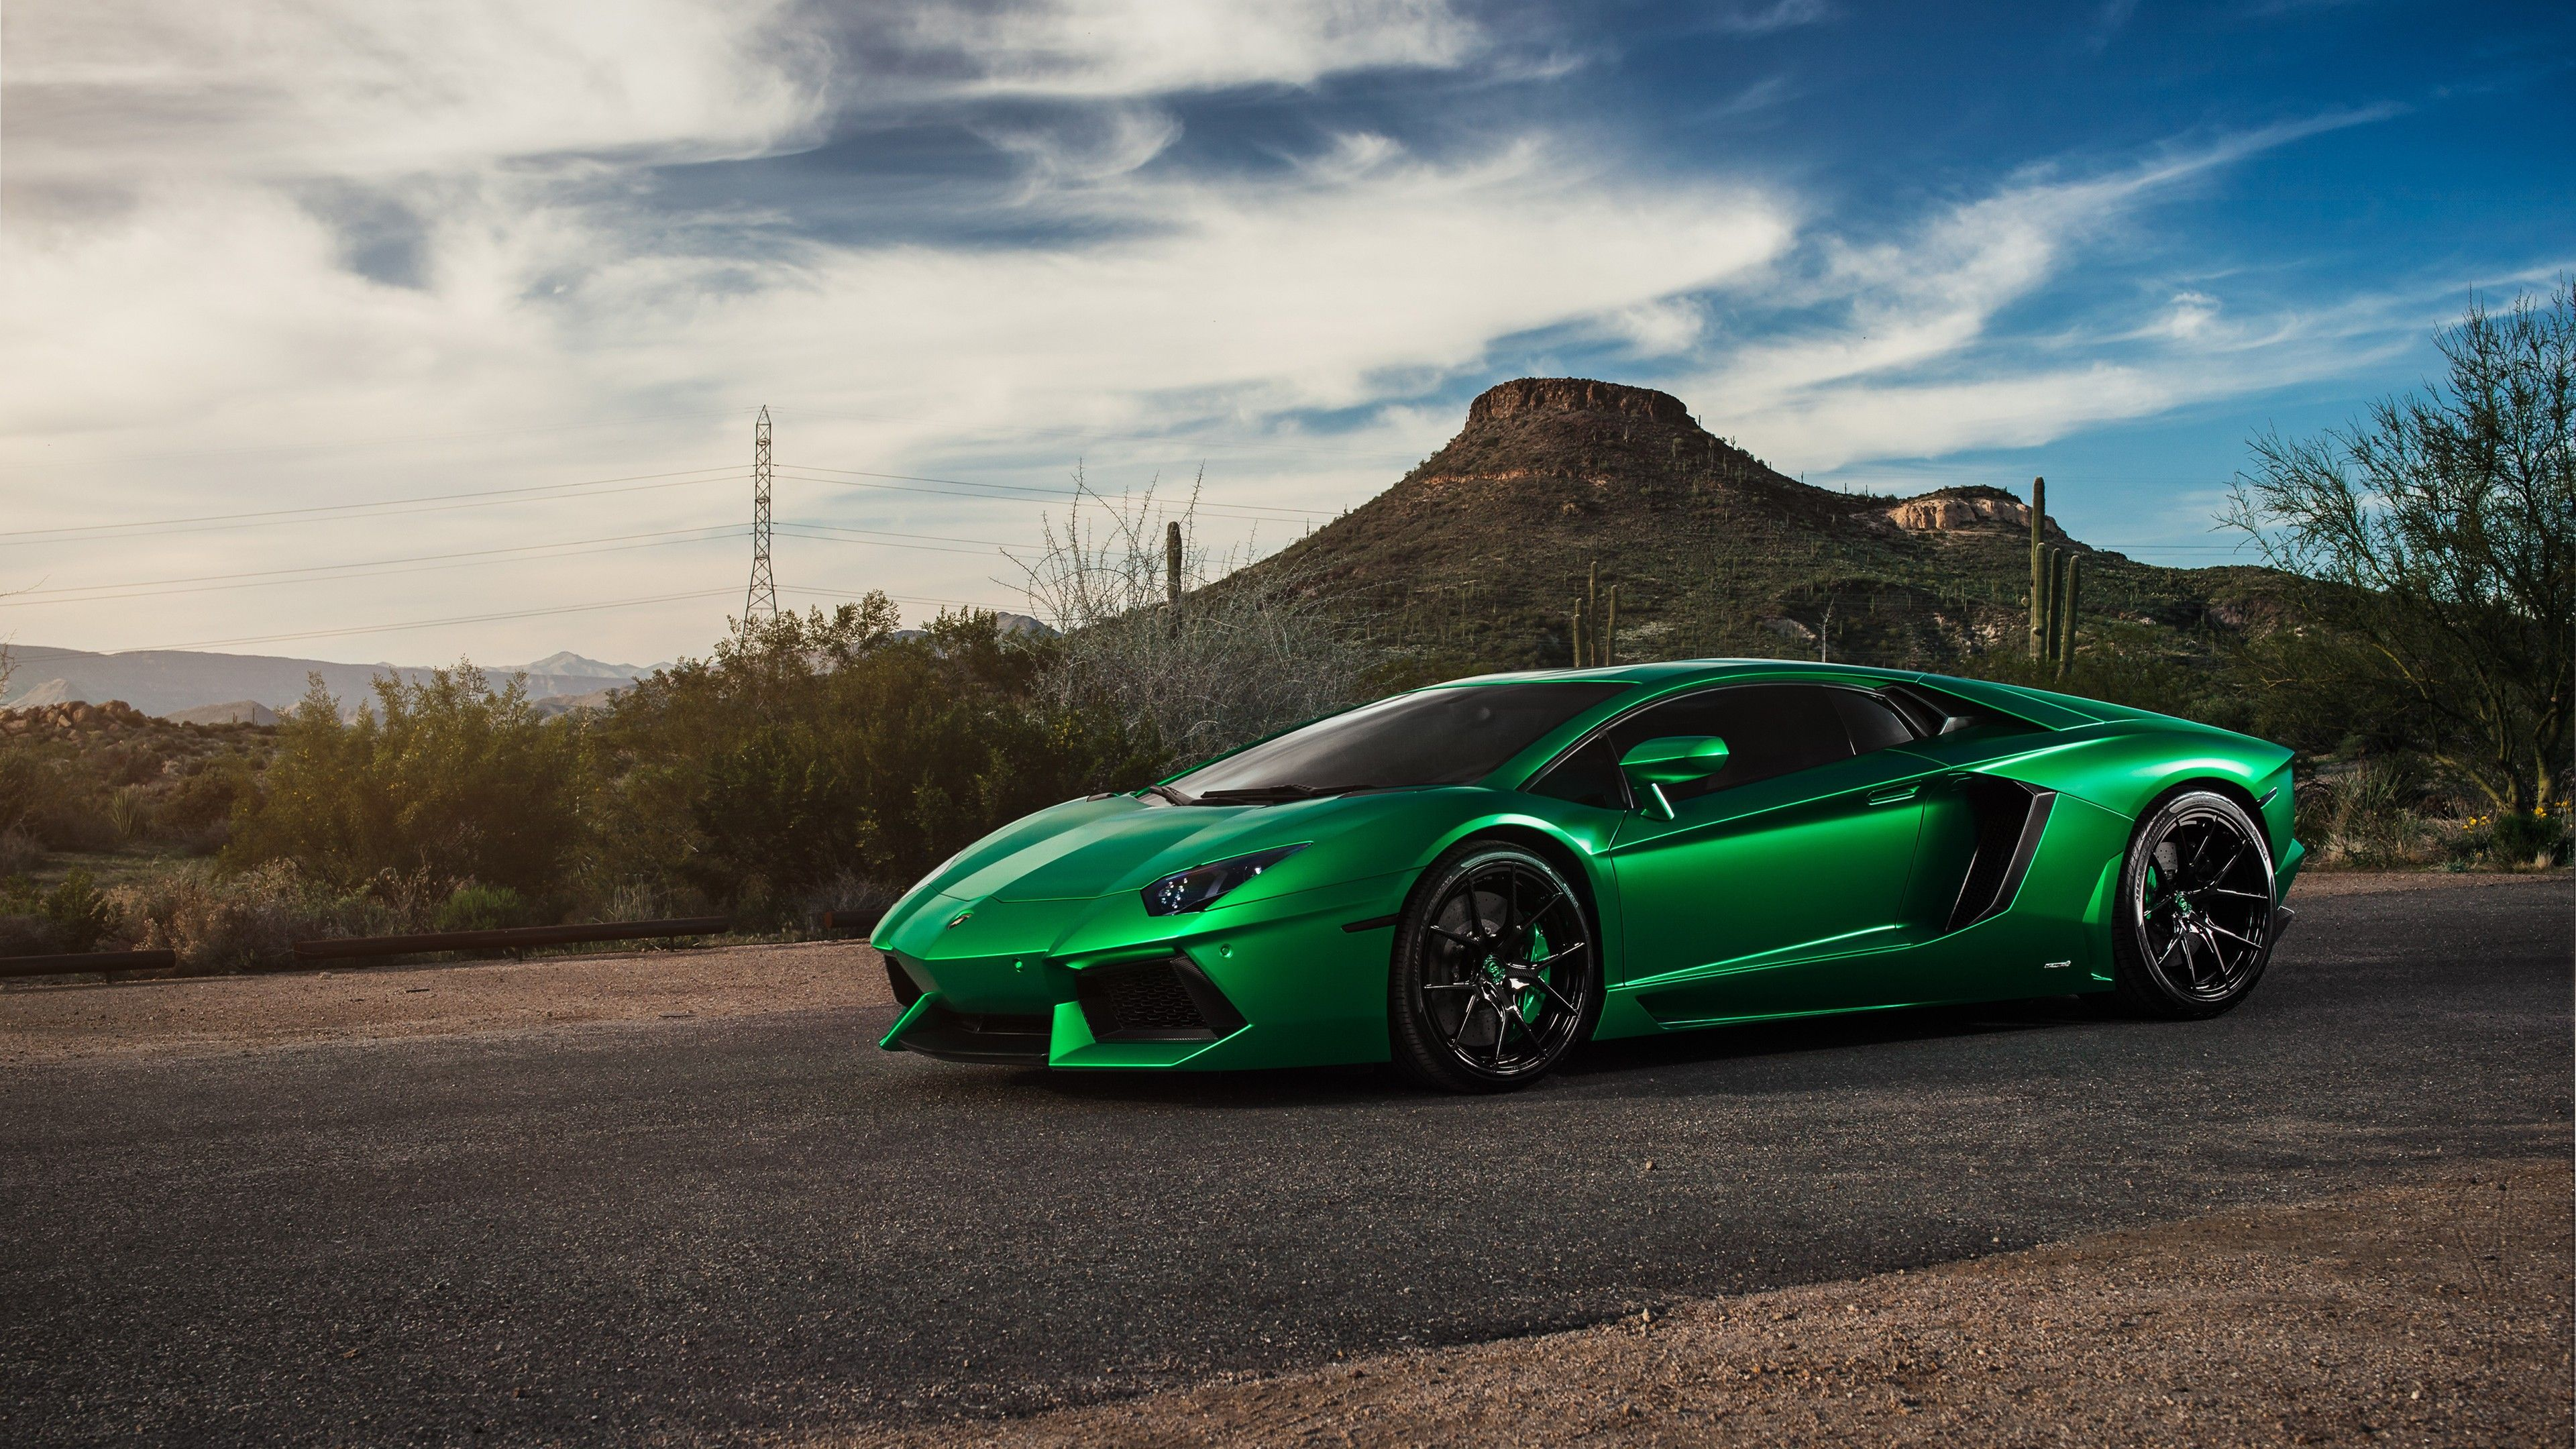 Lamborghini Aventador Green 4k Hd Cars 4k Wallpapers: Top Free 4K Green Backgrounds